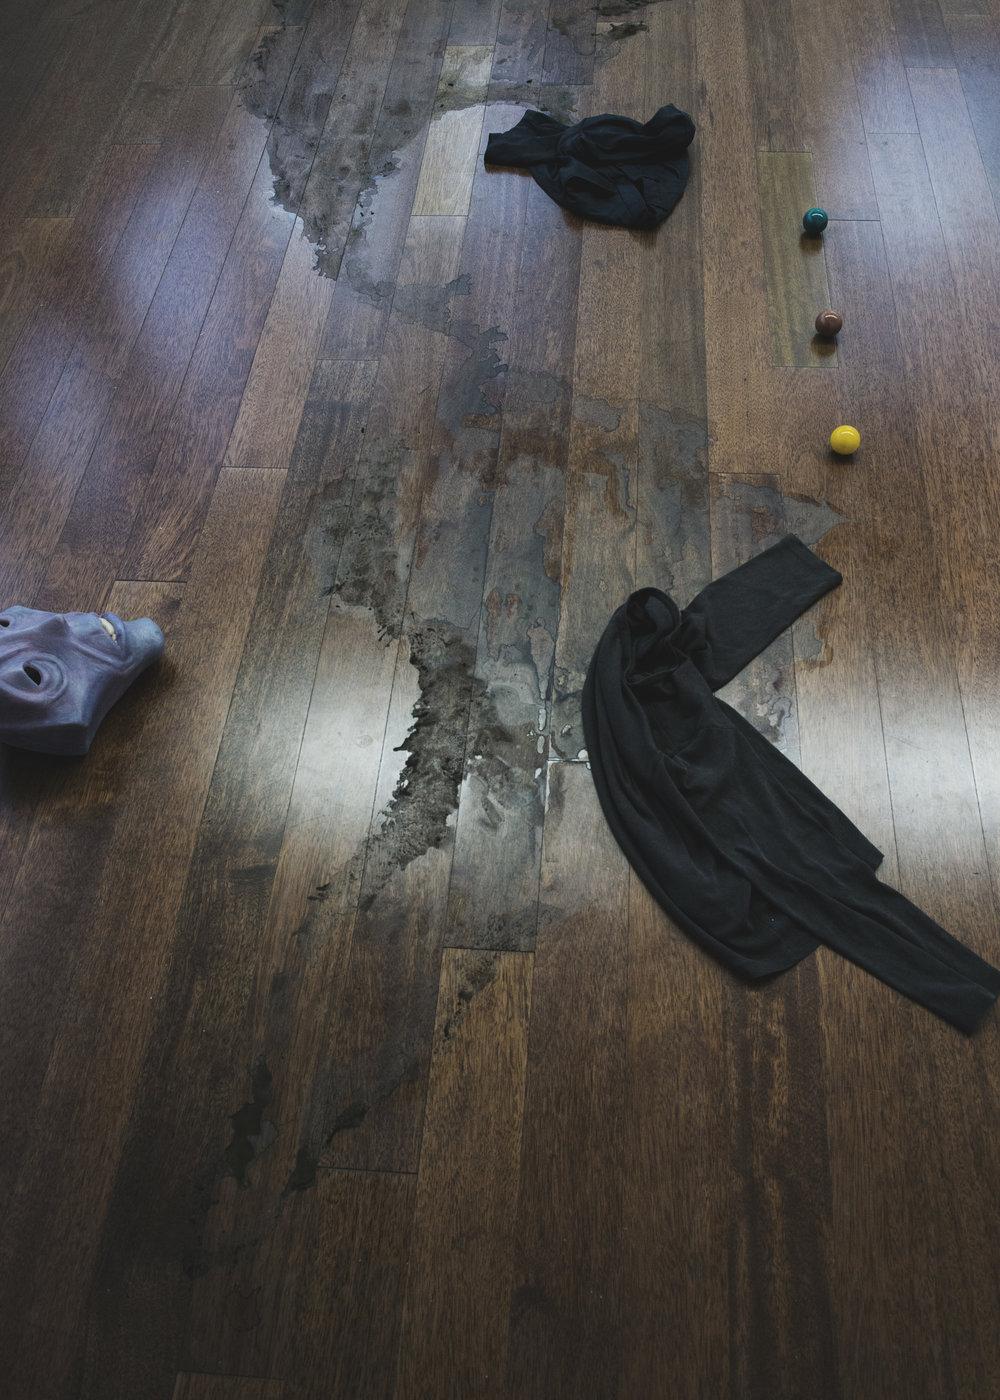 Daniel Klaas Beckwith  ESCHATON  05 May - 16 June 2017 MEYOHAS, New York, NY installation view 2